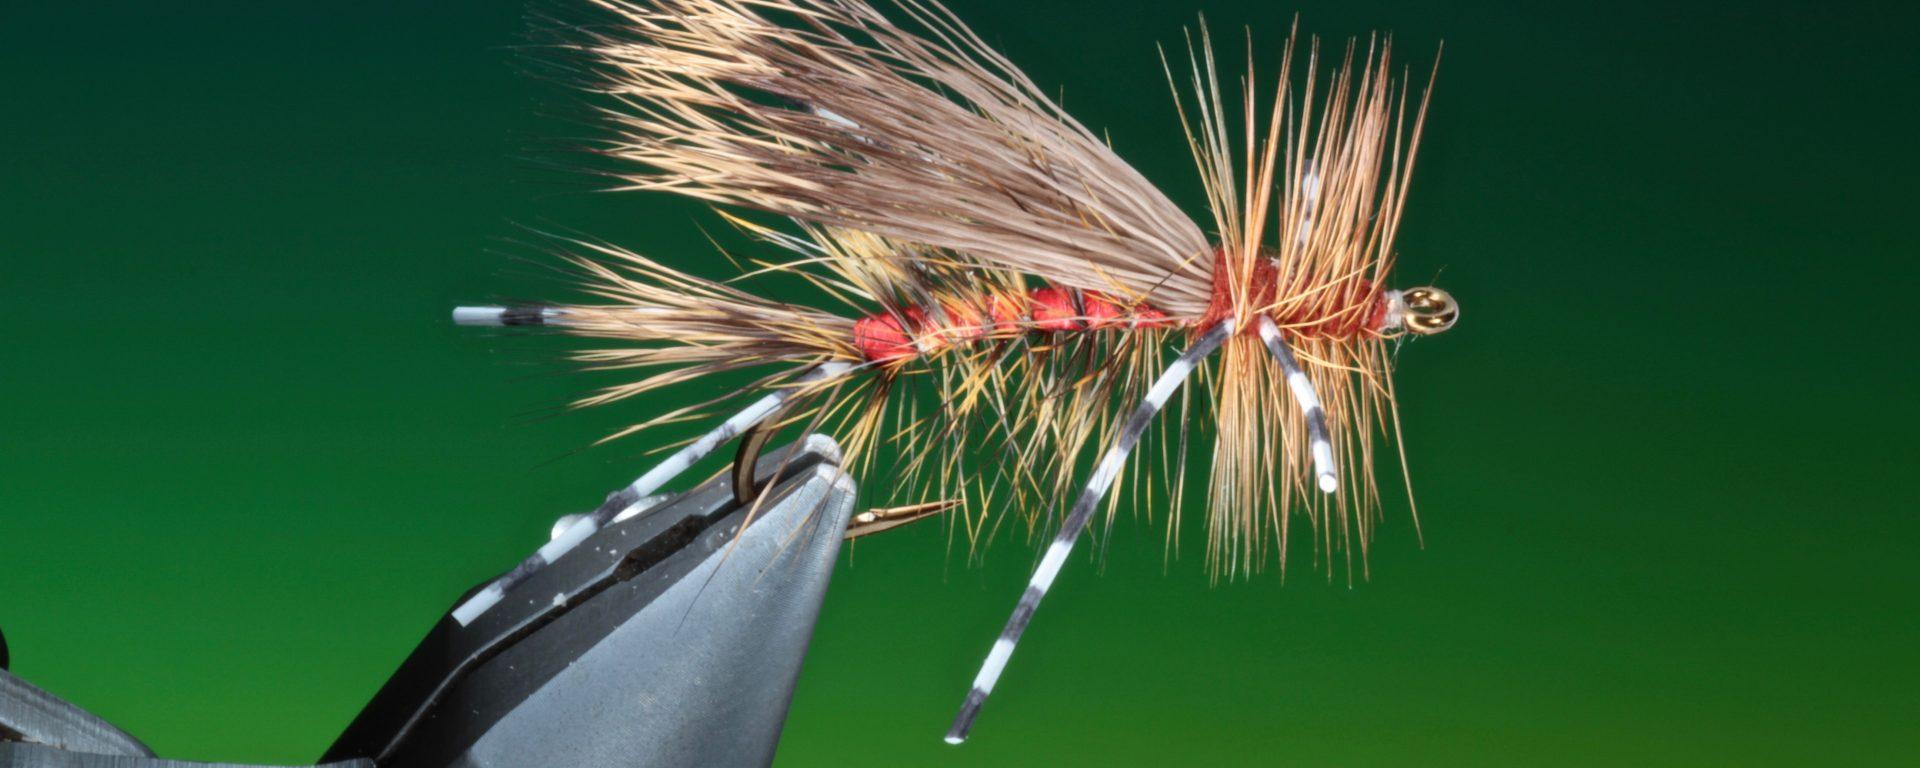 fly tying rubber leg Stimulator